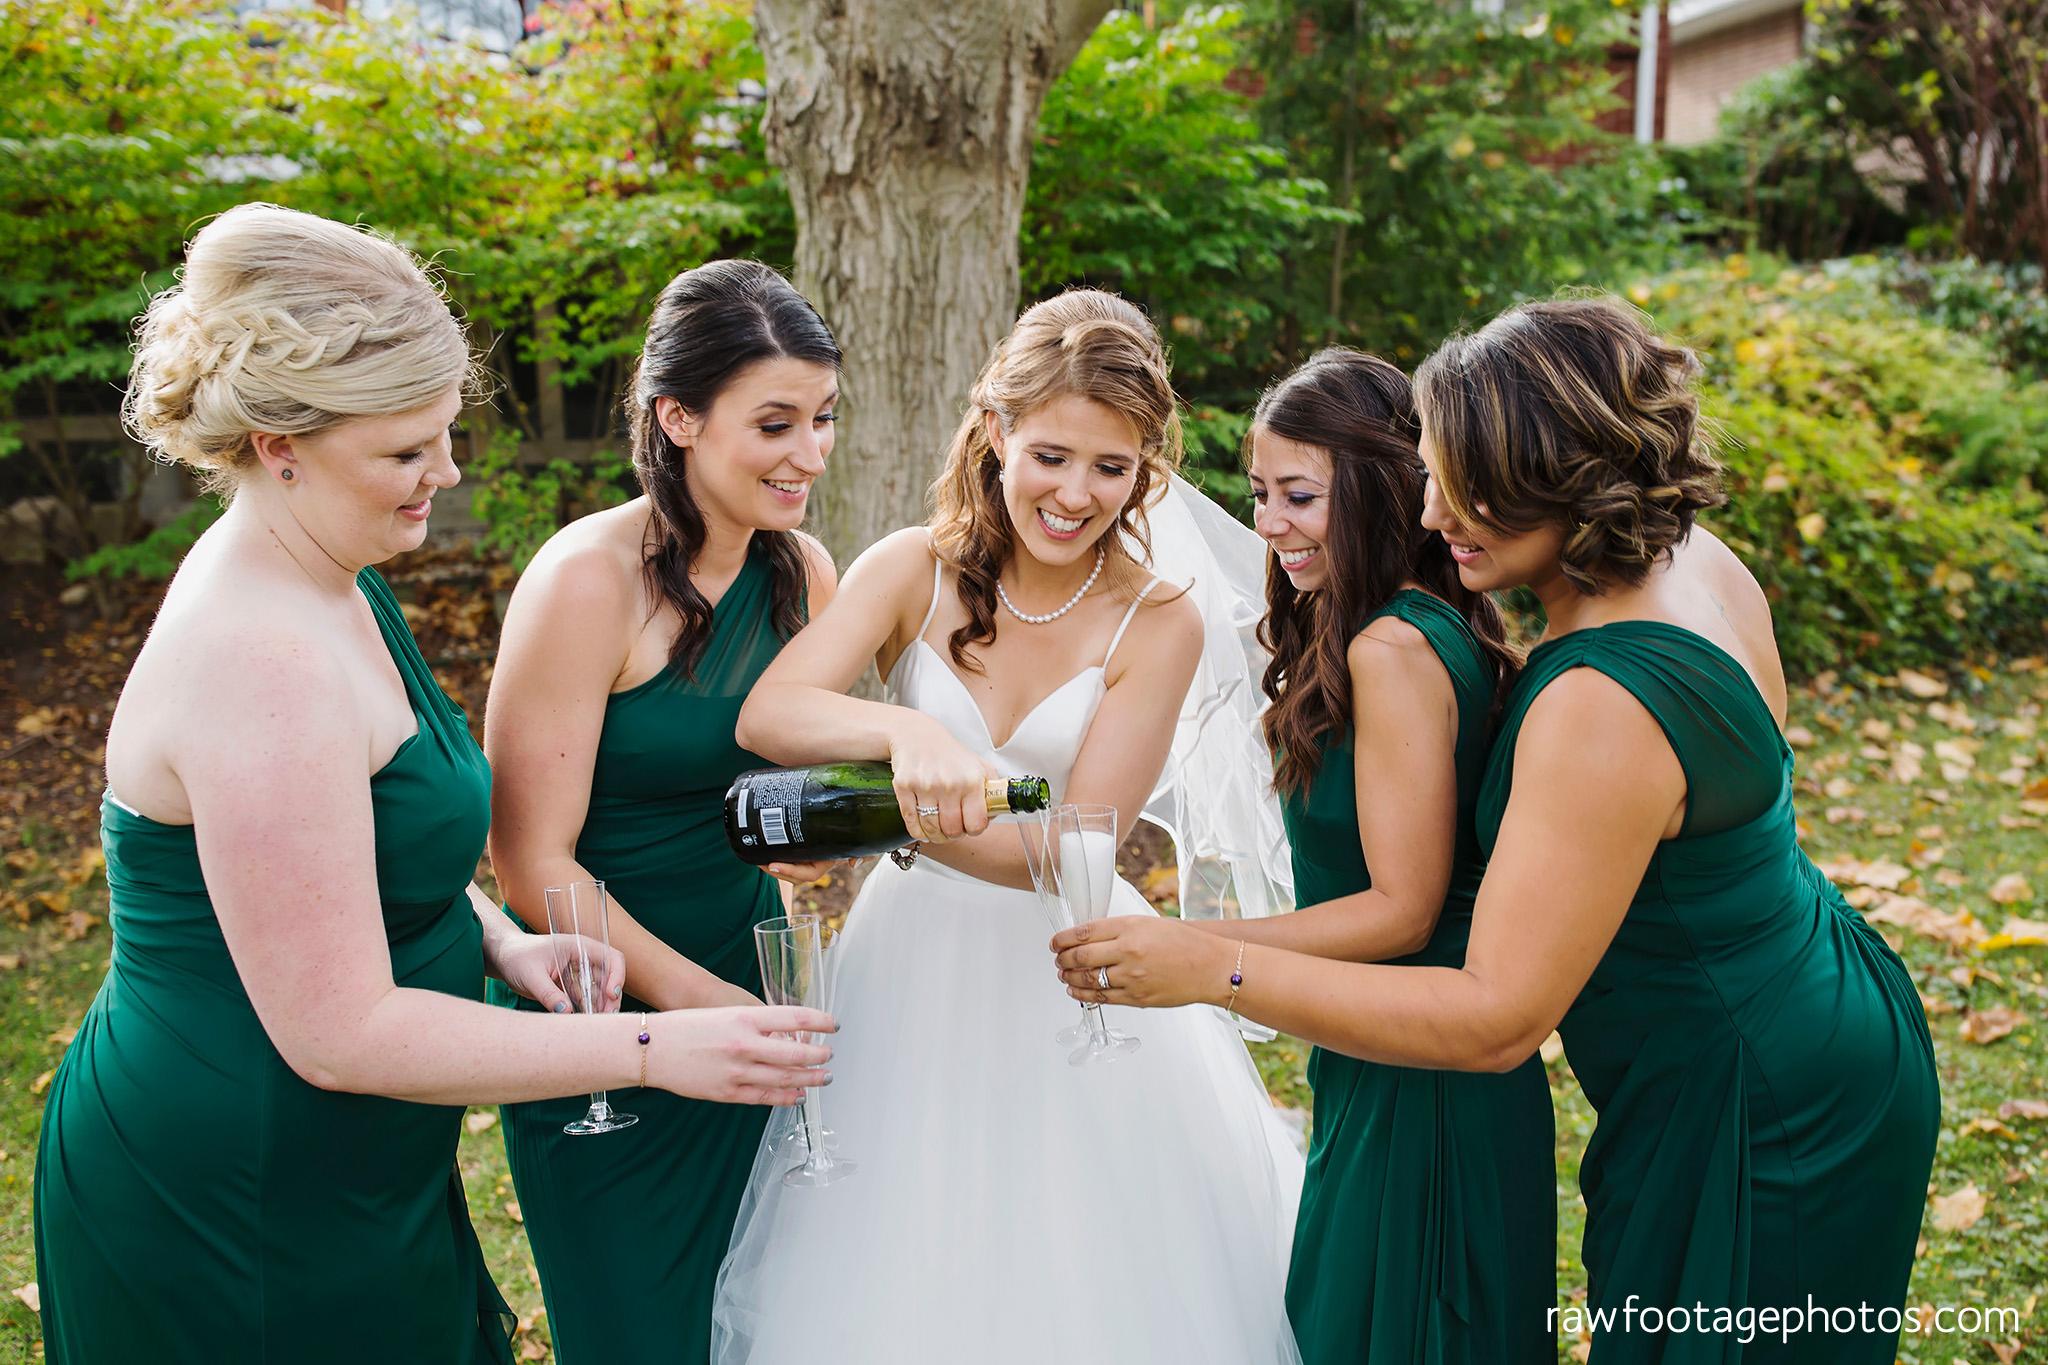 london_ontario_wedding_photographer-civic_gardens-springbank_park-succulent_bouquet-fall_wedding-bridge-raw_footage_photography022.jpg